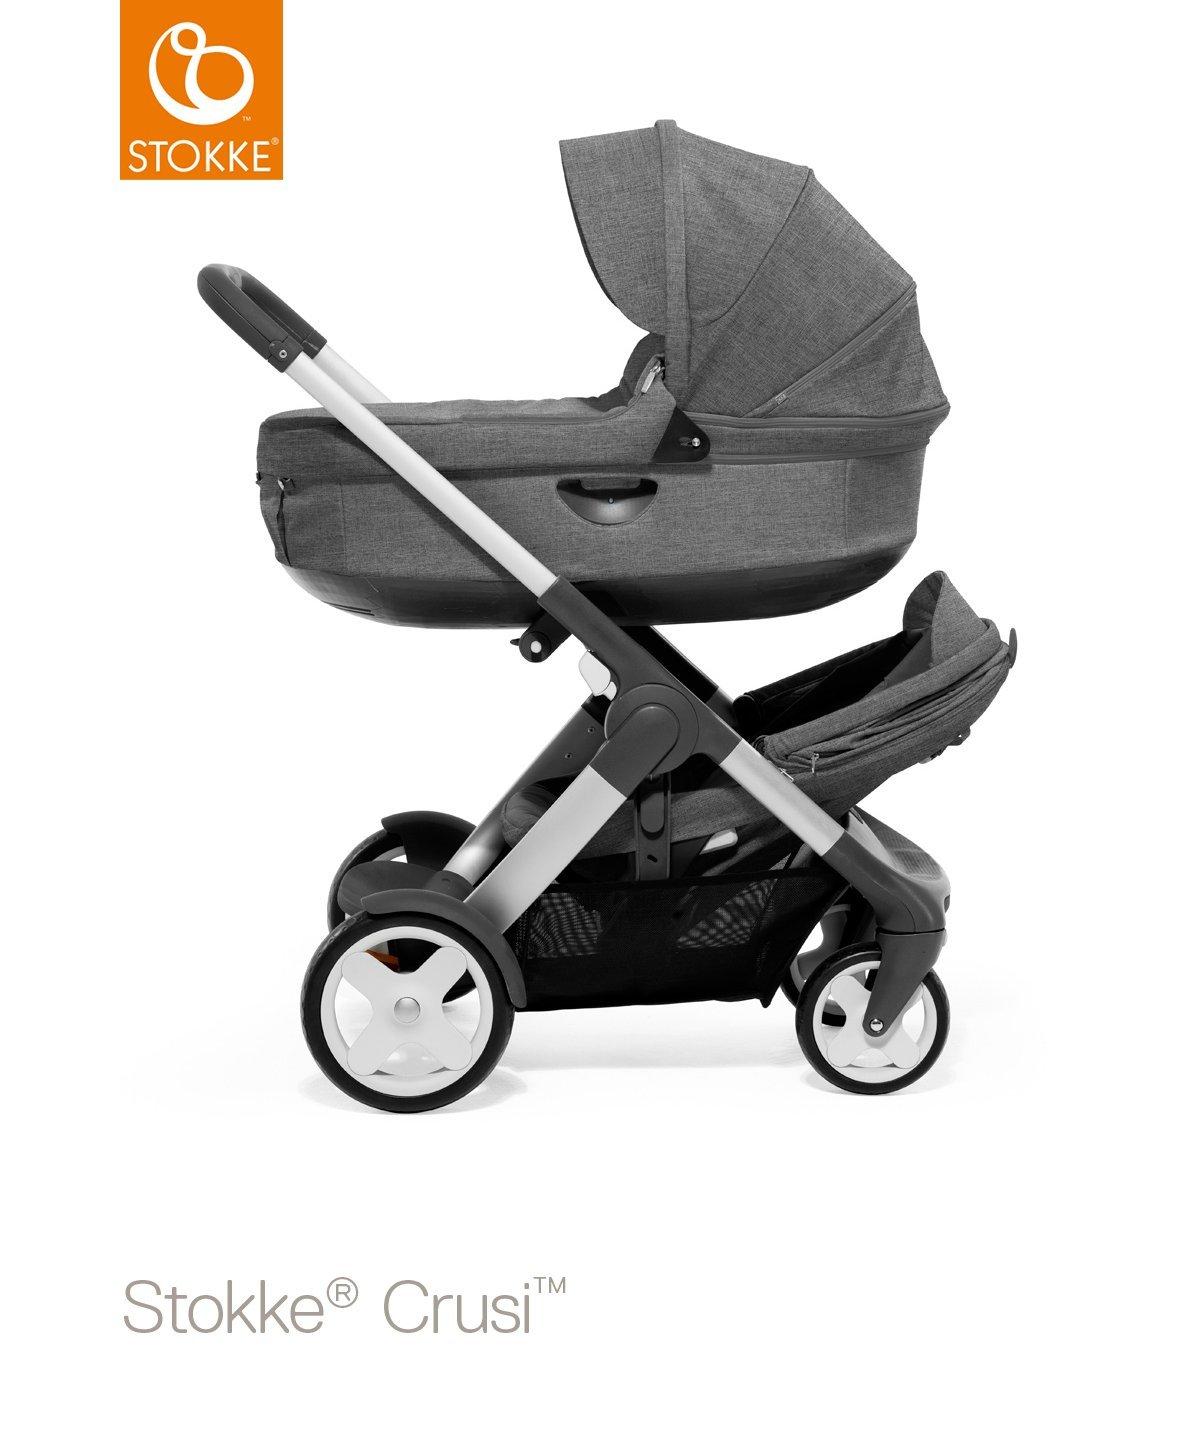 Amazon Com Stokke Crusi Stroller Sibling Adapter Kit Baby